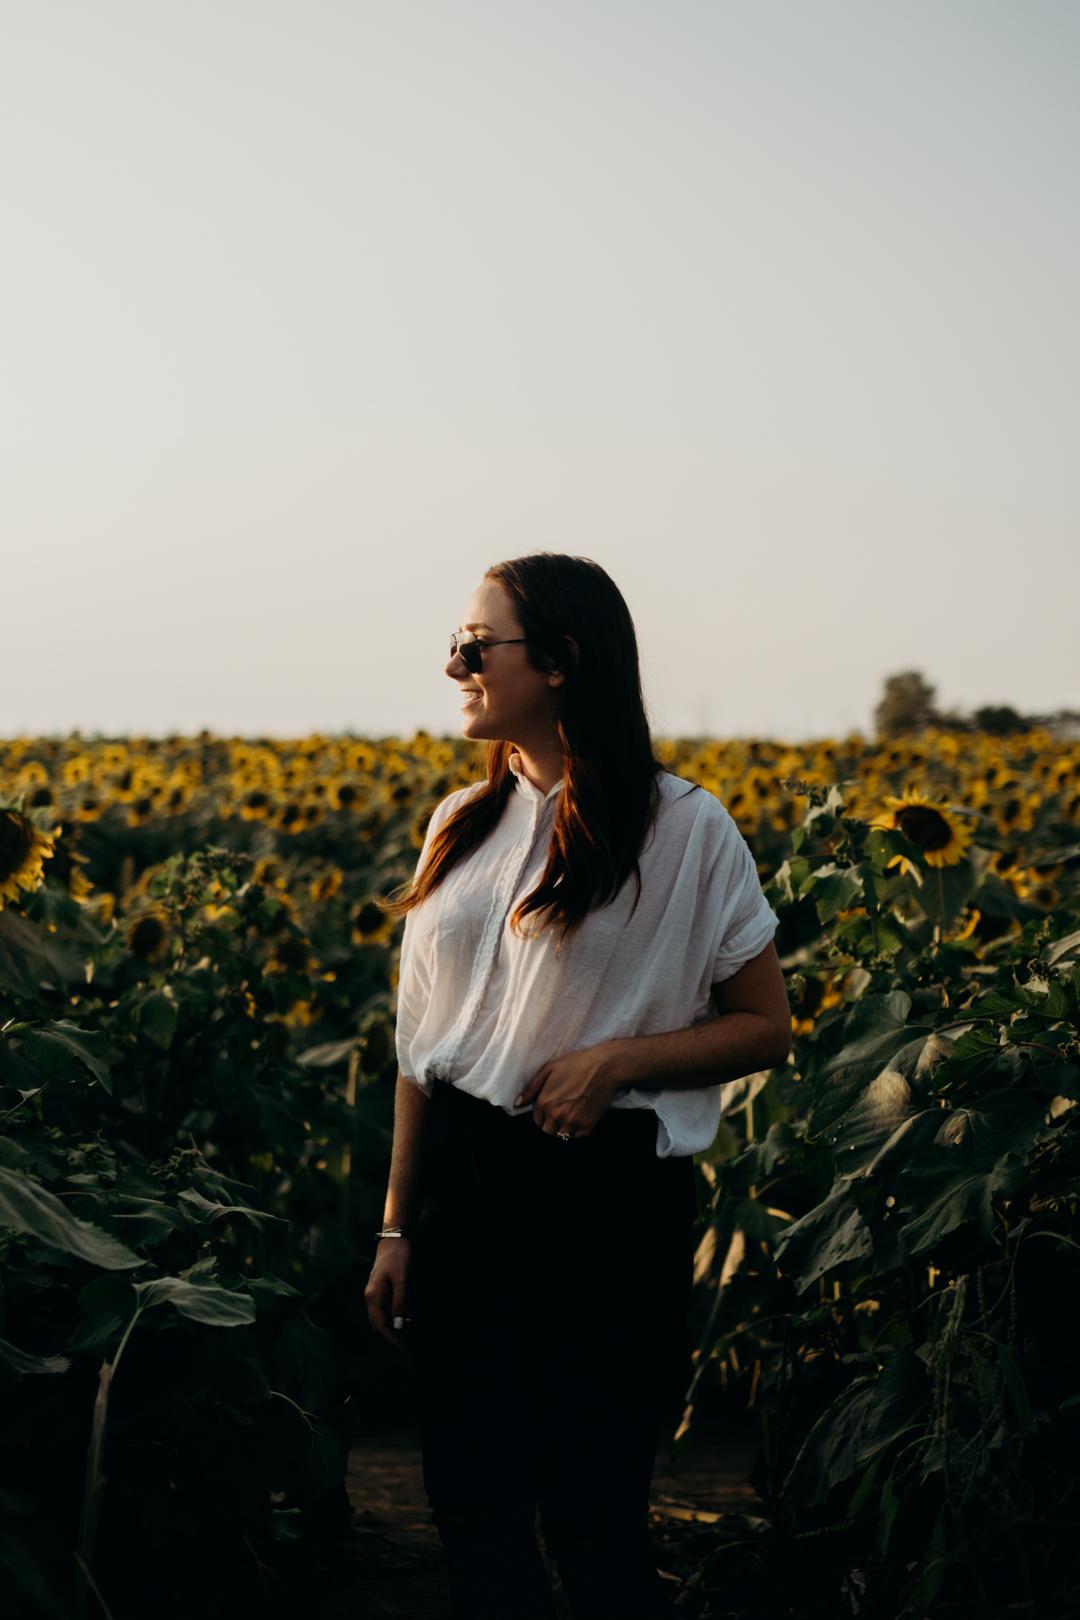 20170909_Grinters Farms Sunflower Fields Lawrence Kansas__11.jpg